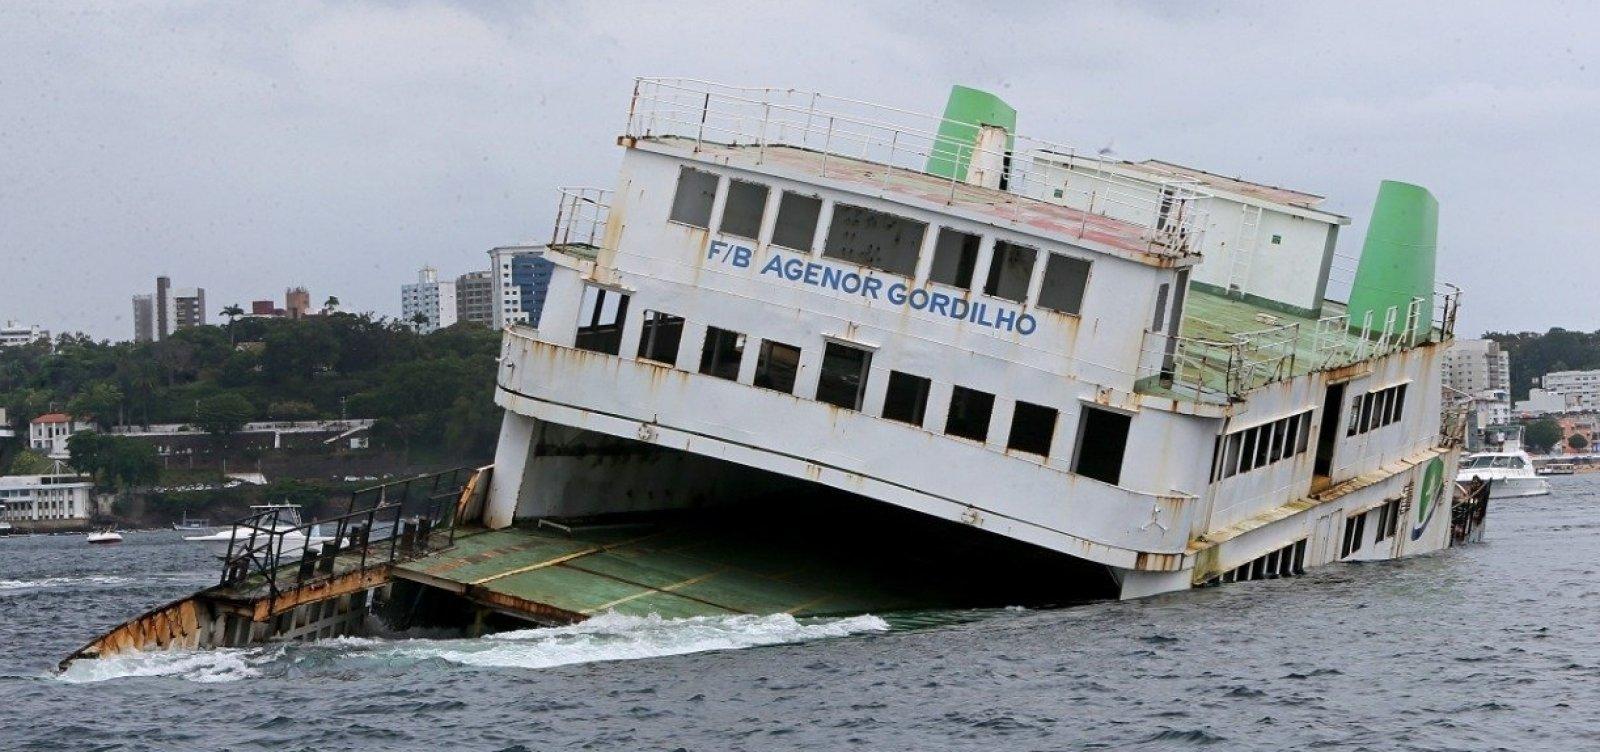 Ferry-boat Agenor Gordilho é afundado na Baía de Todos-os-Santos